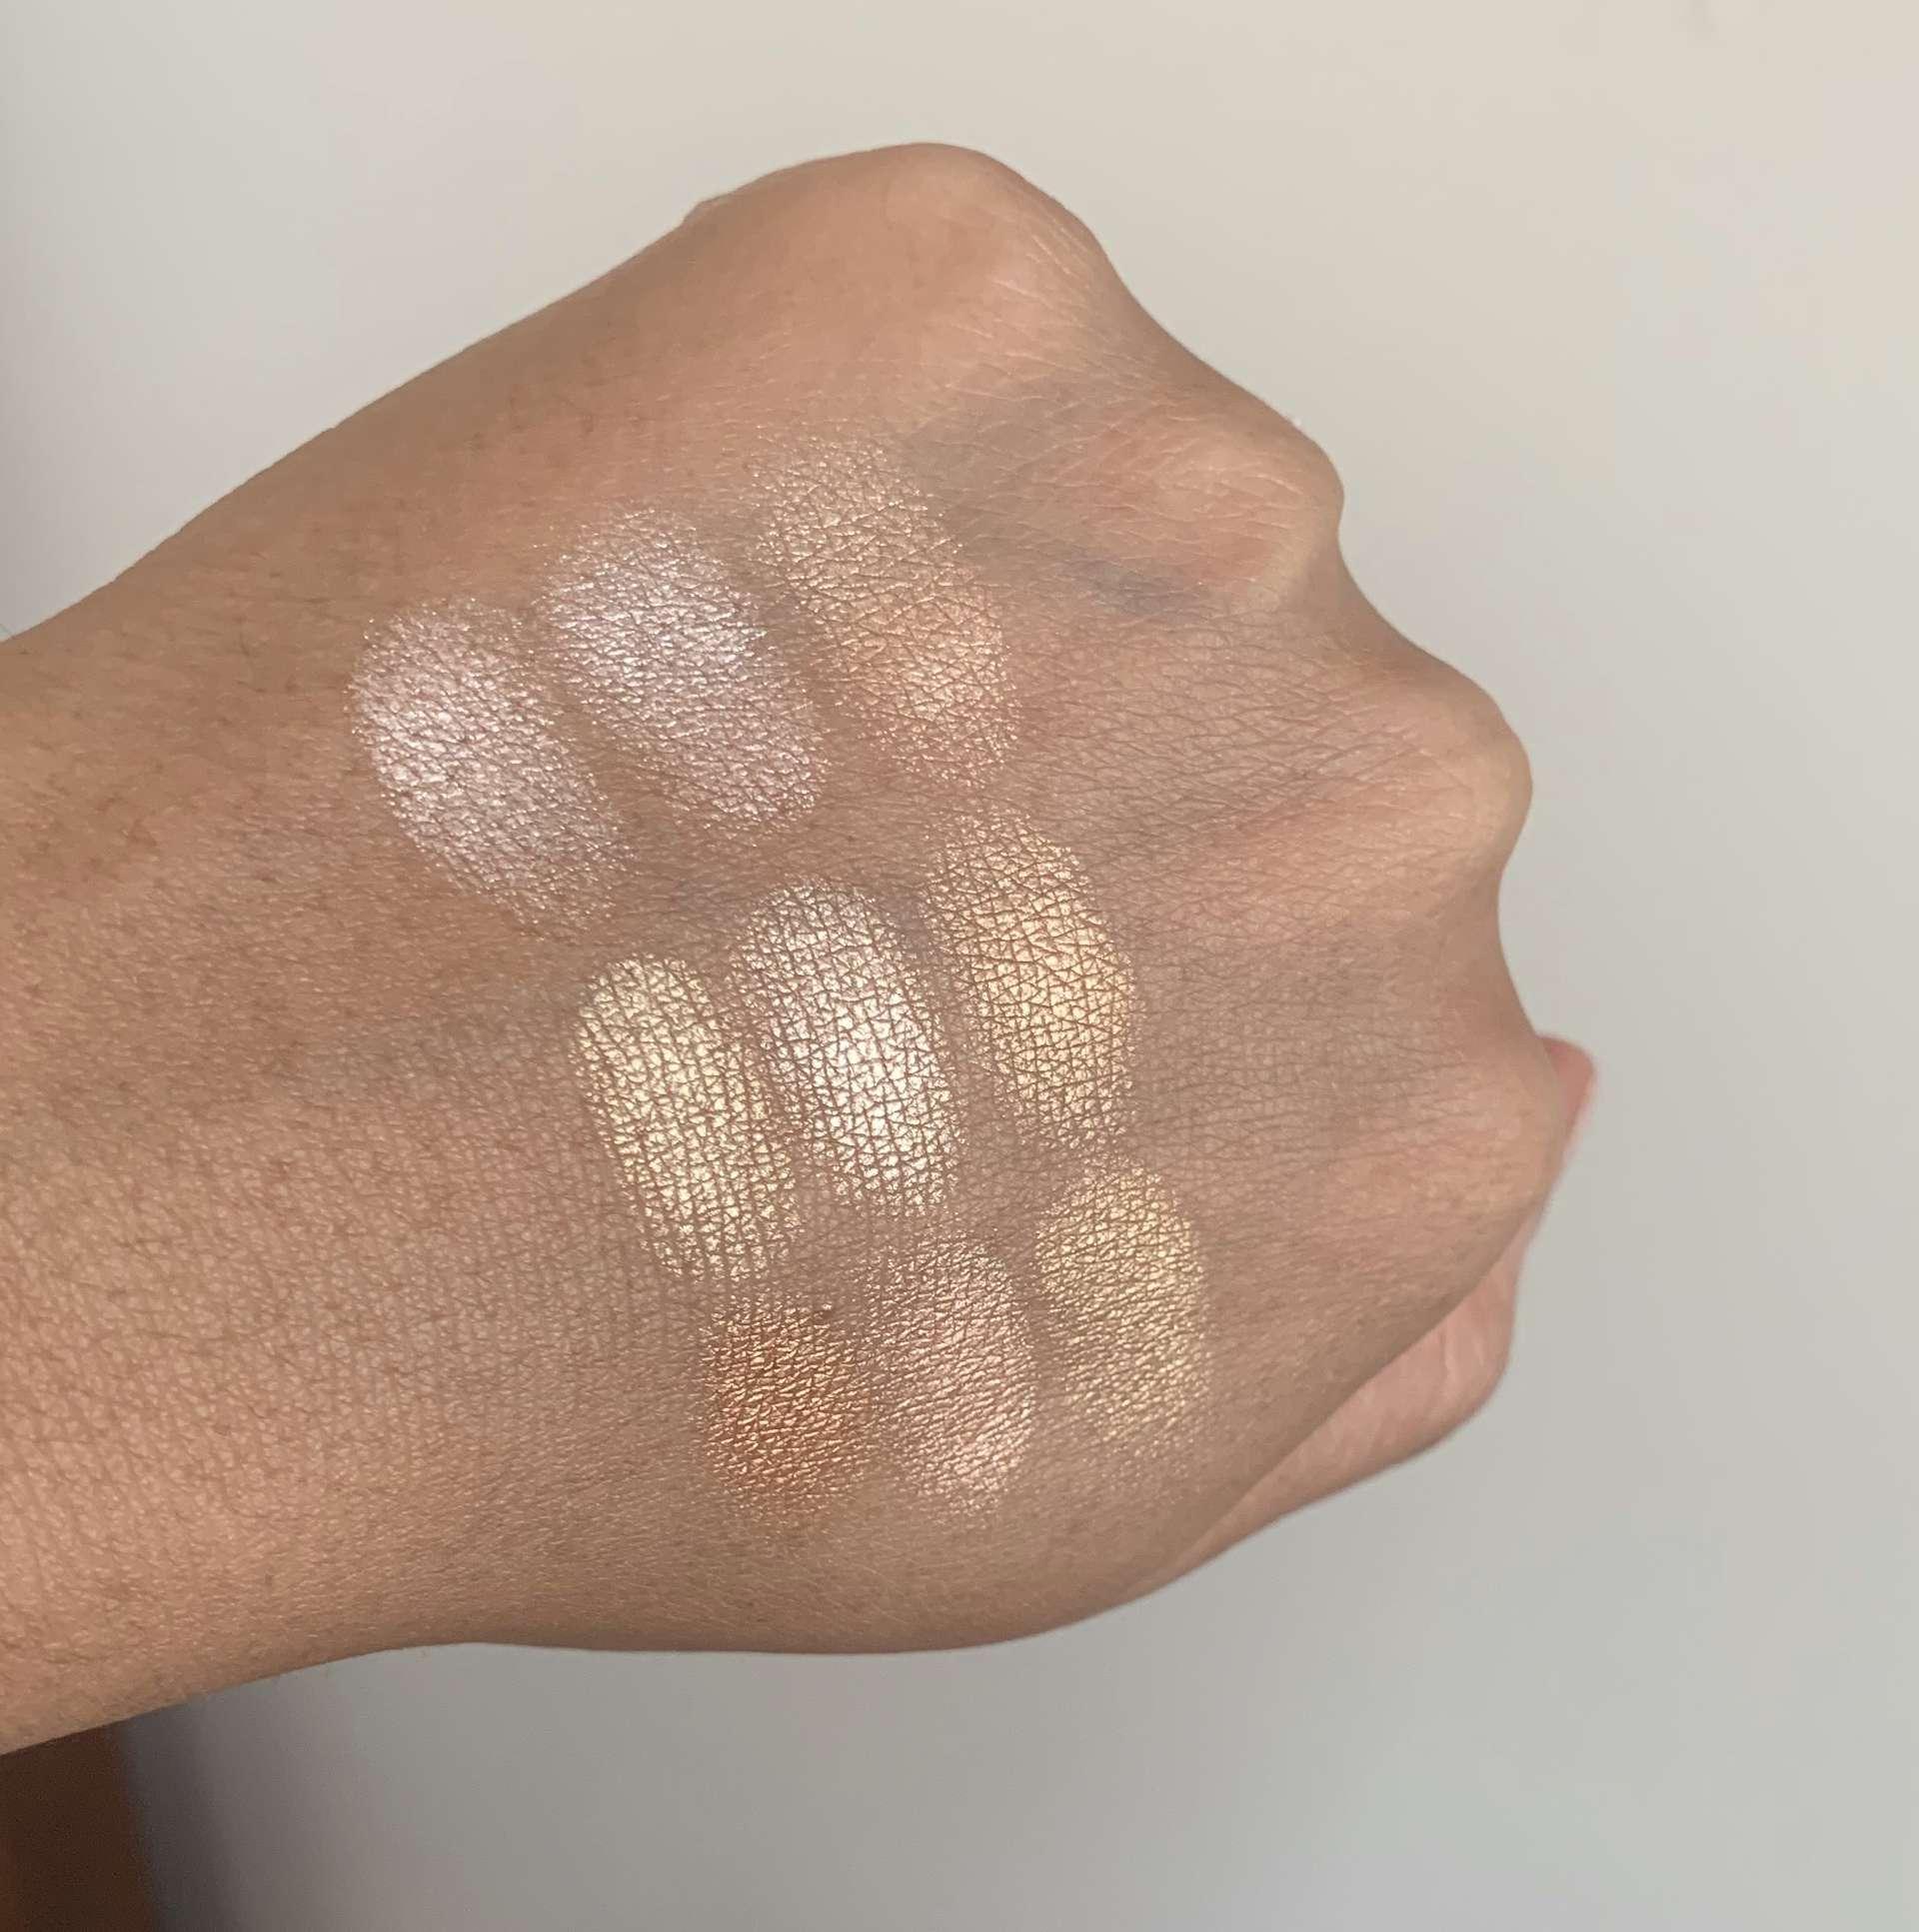 MAC Hyper Real Glow Palettes (flash + awe, get it glowin, shimmy peach) swatches dark skin